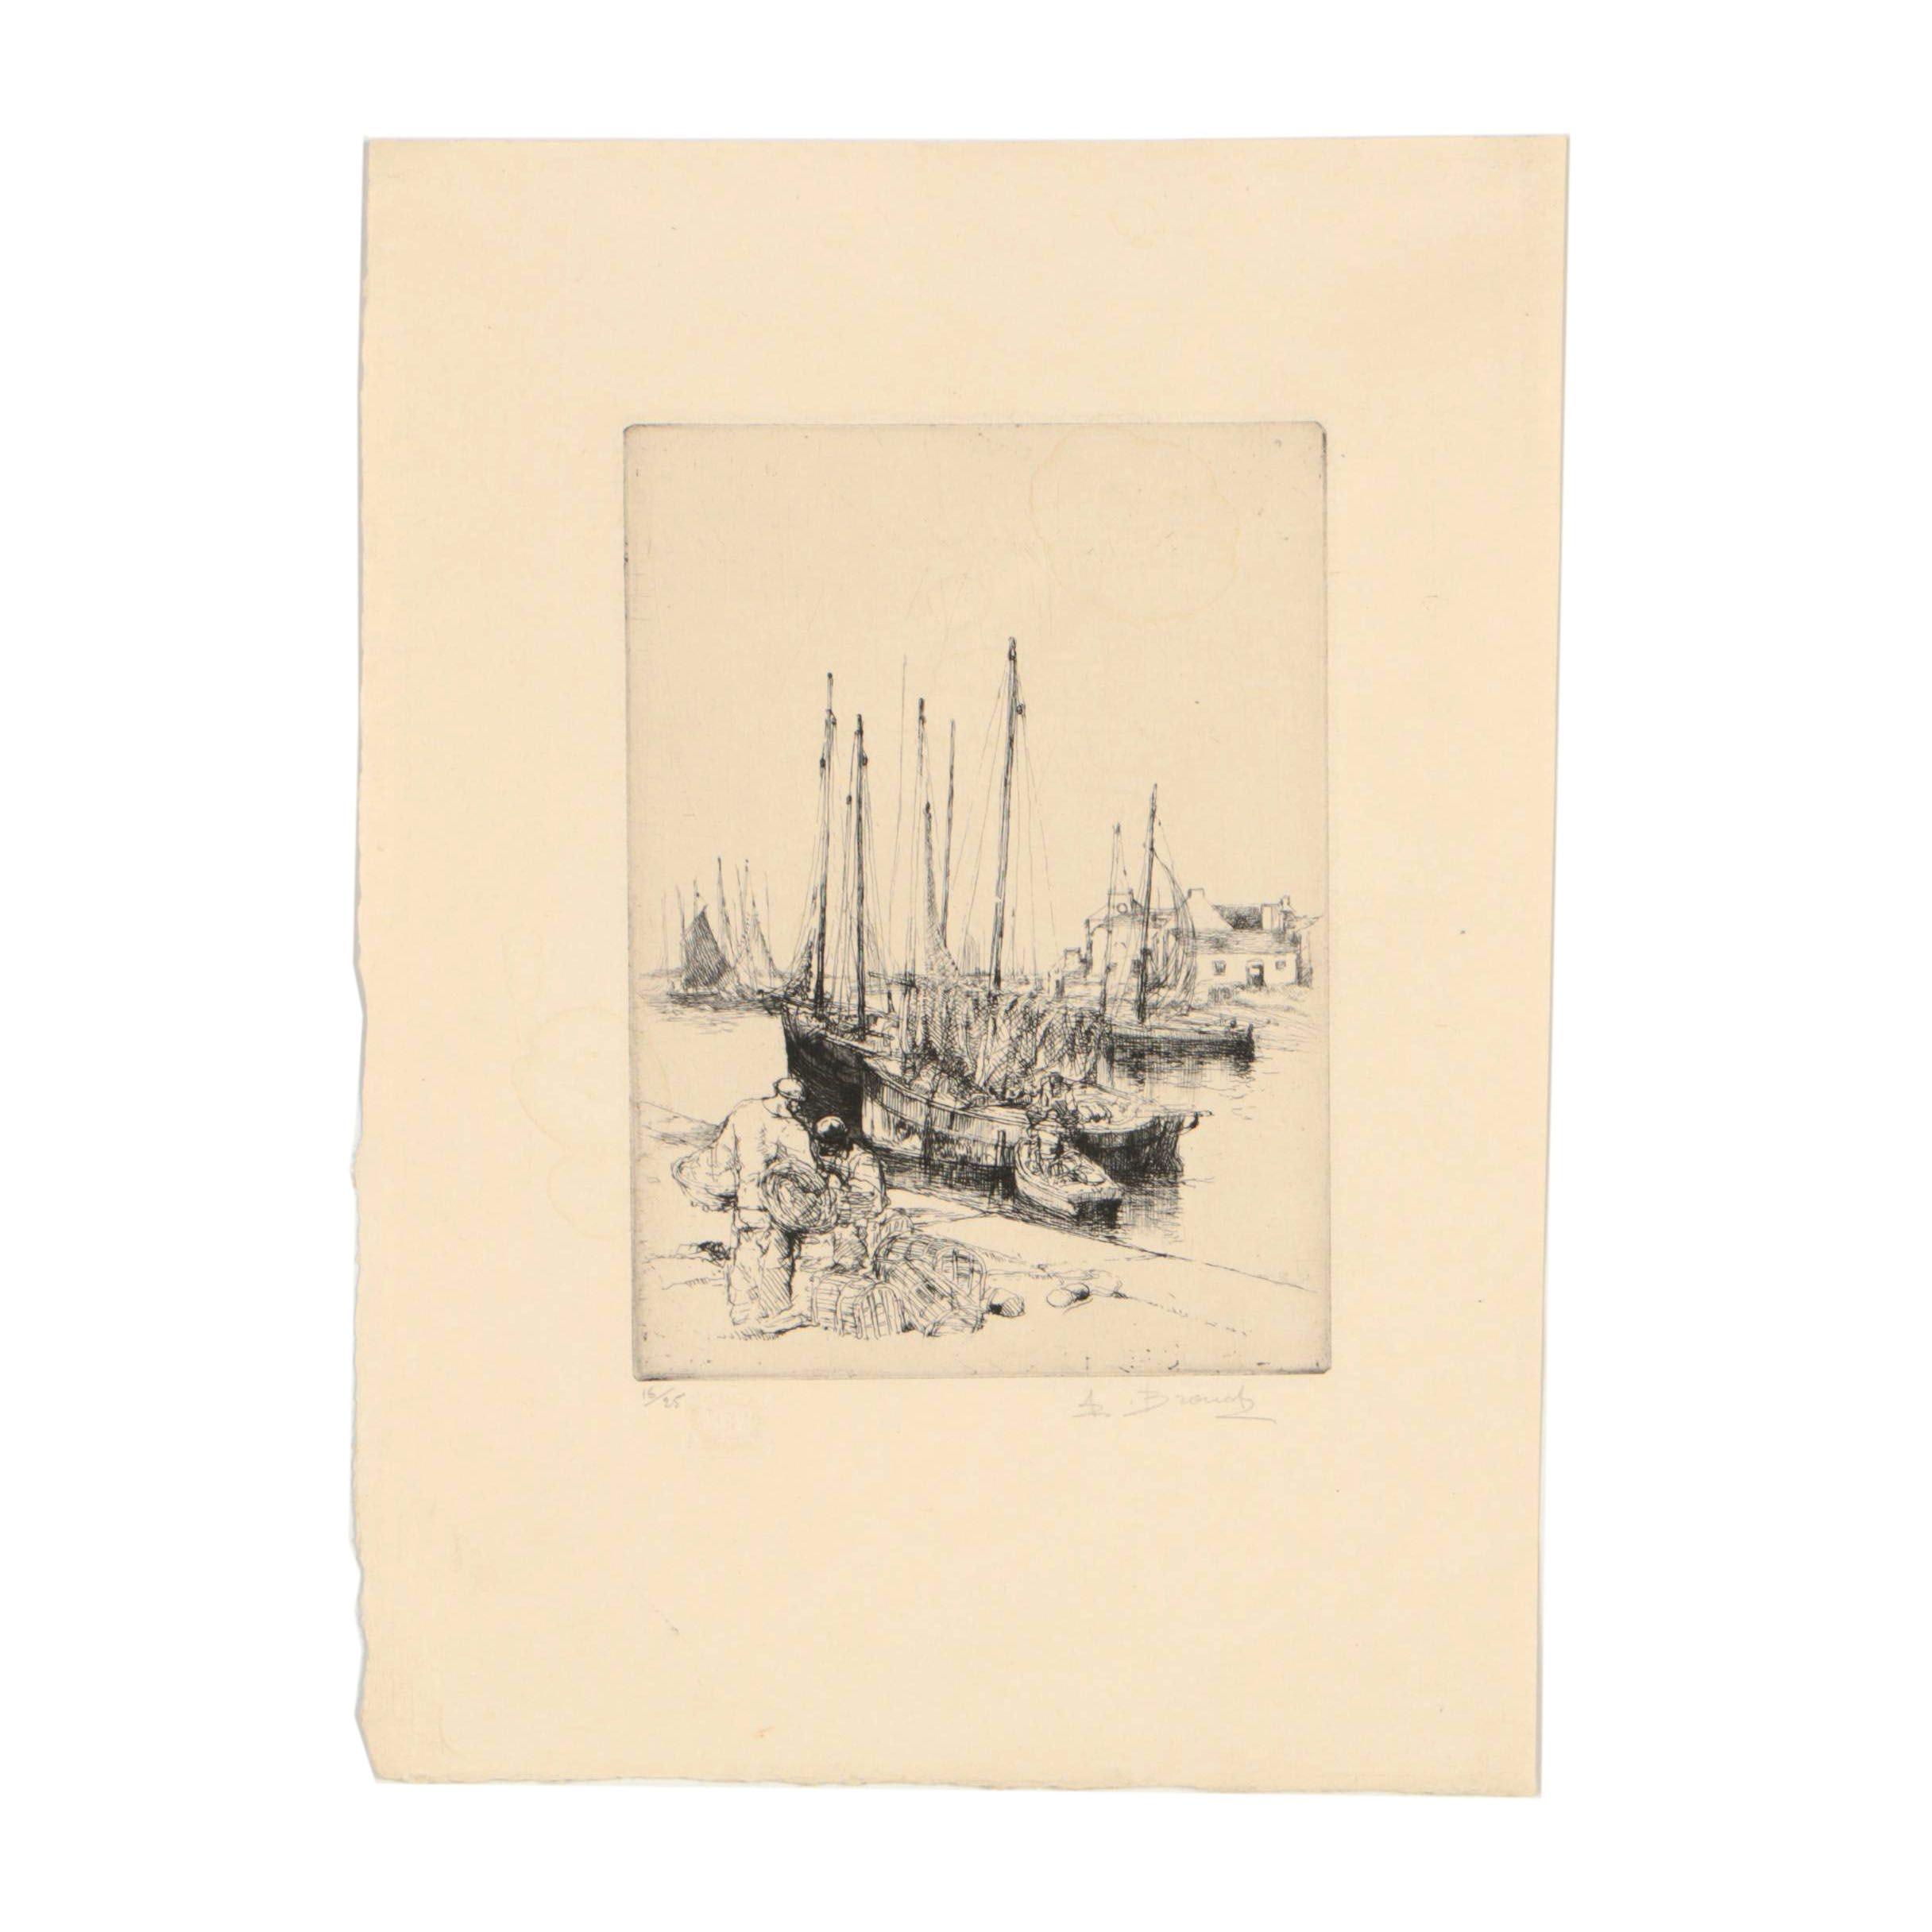 Auguste Brouet Etching of Harbor Scene